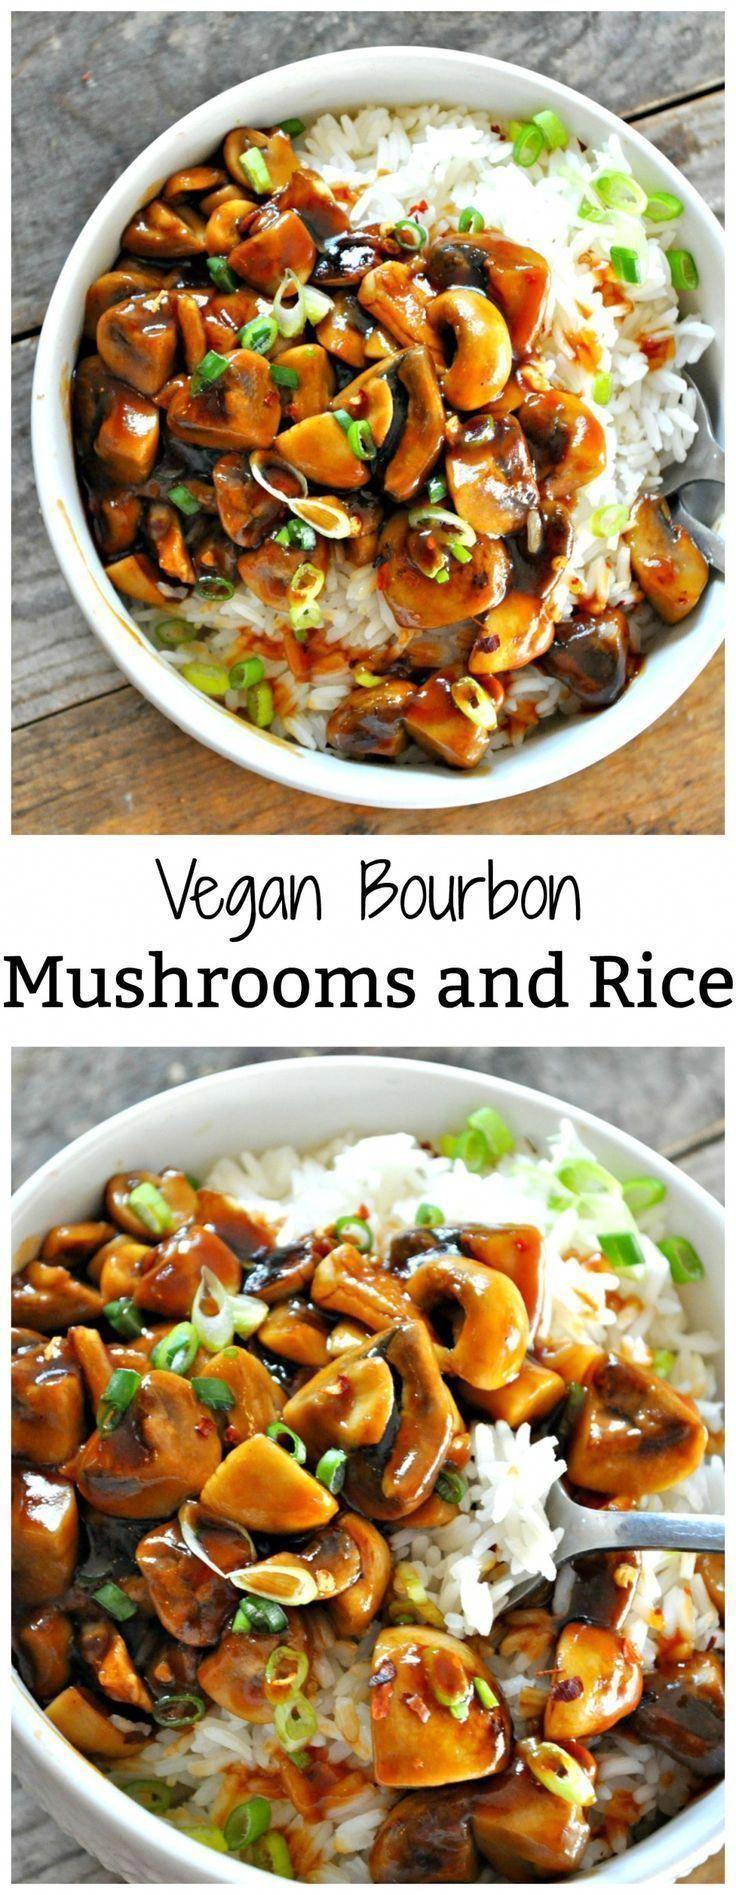 Vegan Bourbon Mushrooms and Rice - Rabbit and Wolves ,  #bourbon #Drink #Food #MealPlan #MealPlanning #Meat #Mushrooms #Planning #Rabbit #Rice #Snacks #Vegan #Wolves